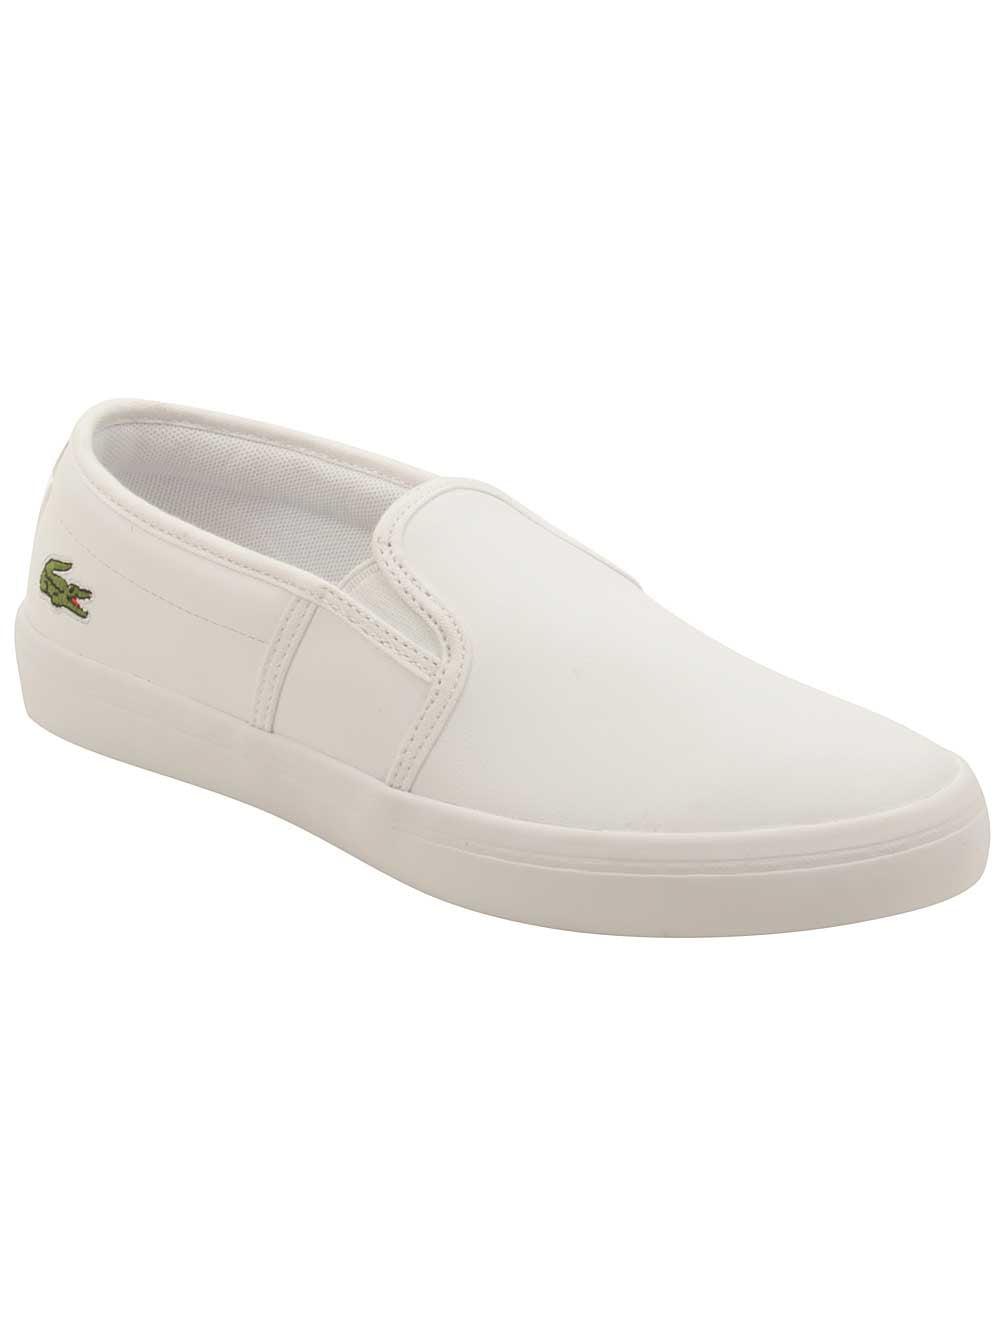 4c753b4769c9b4 Lacoste - Lacoste Womens Gazon BL 1 Sneakers in White - Walmart.com